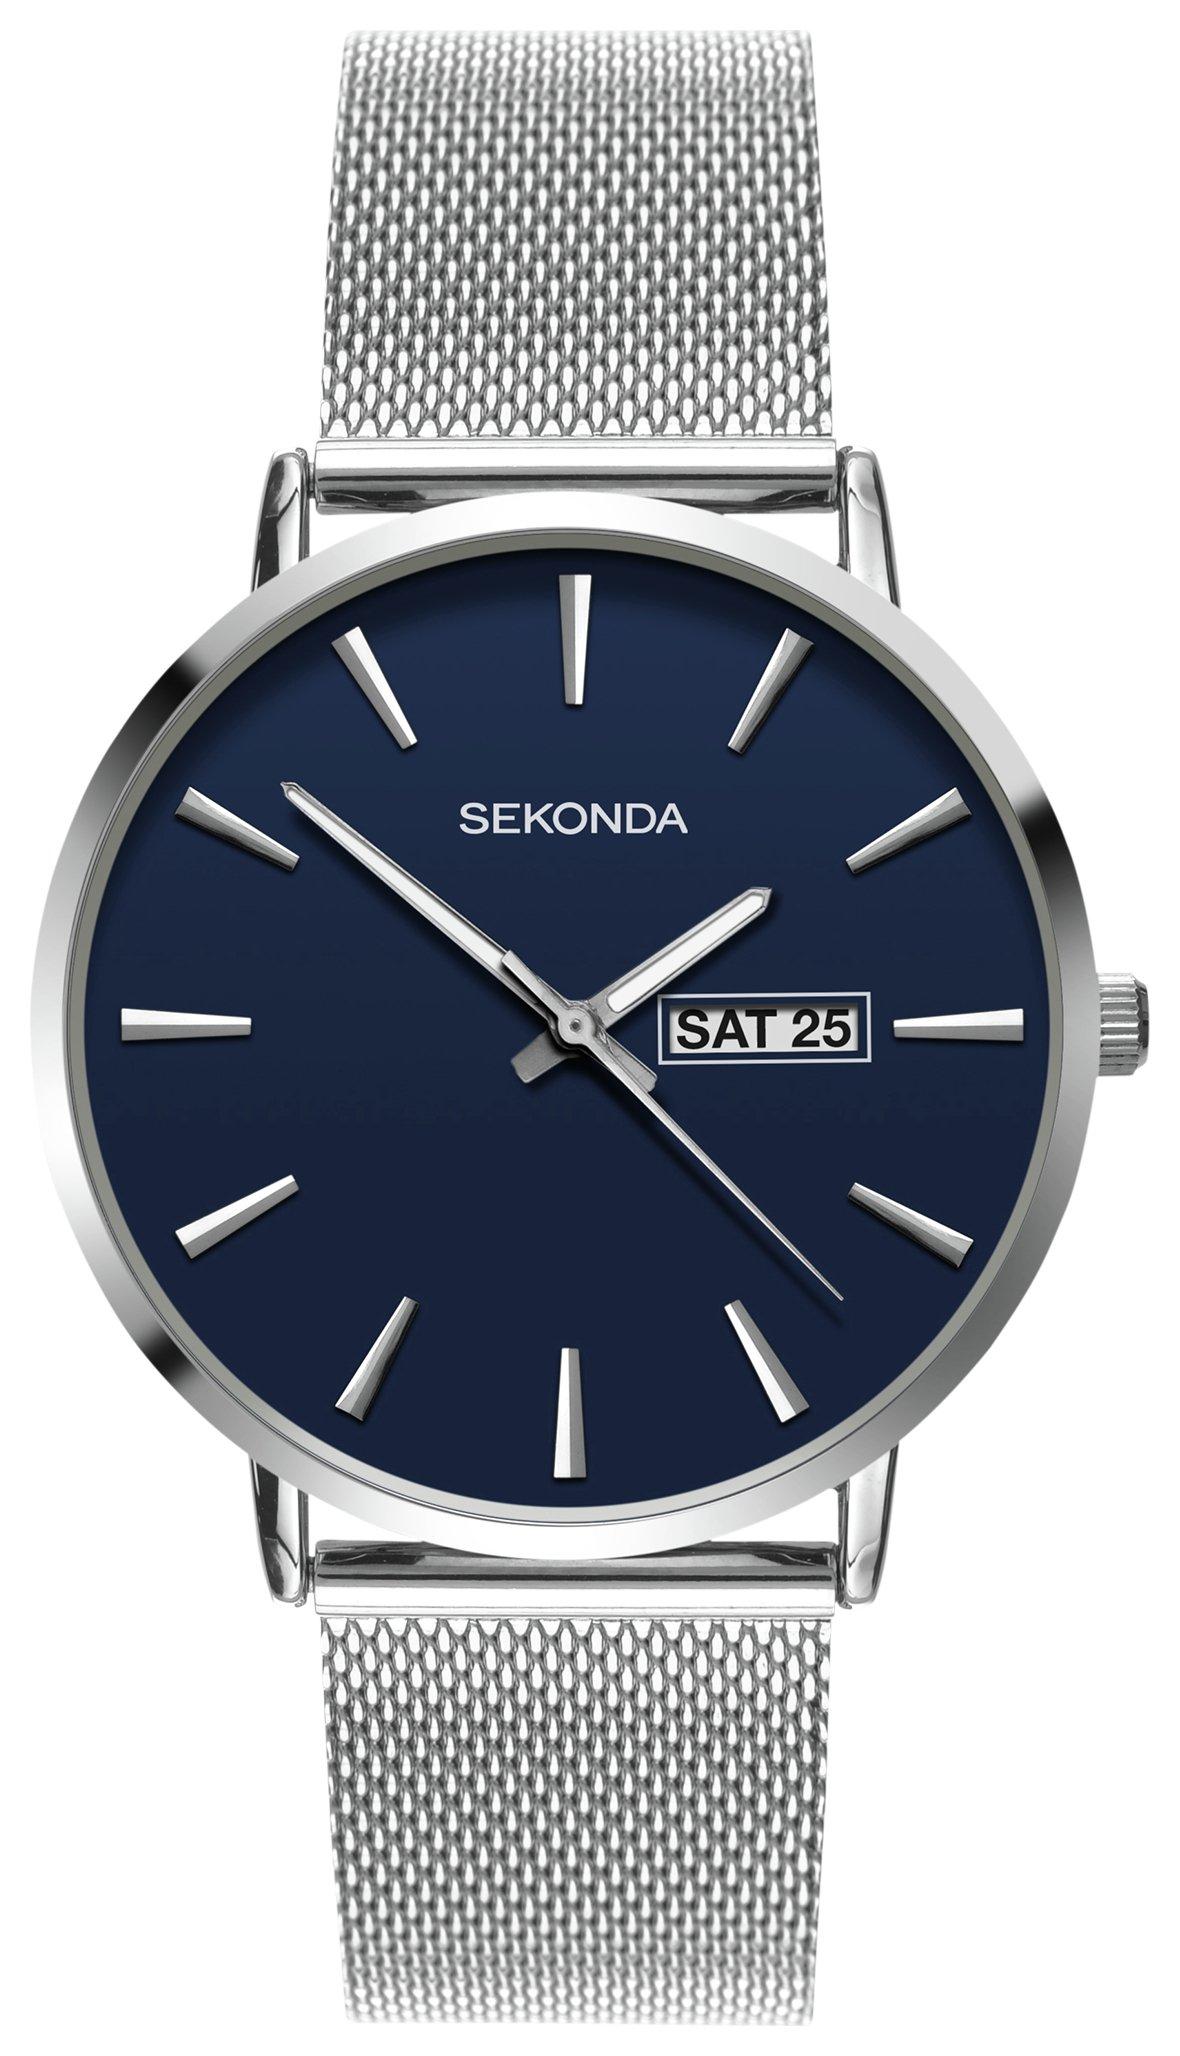 Sekonda Men's Stainless Steel Mesh Bracelet Watch @ Argos Free C&C £24.99